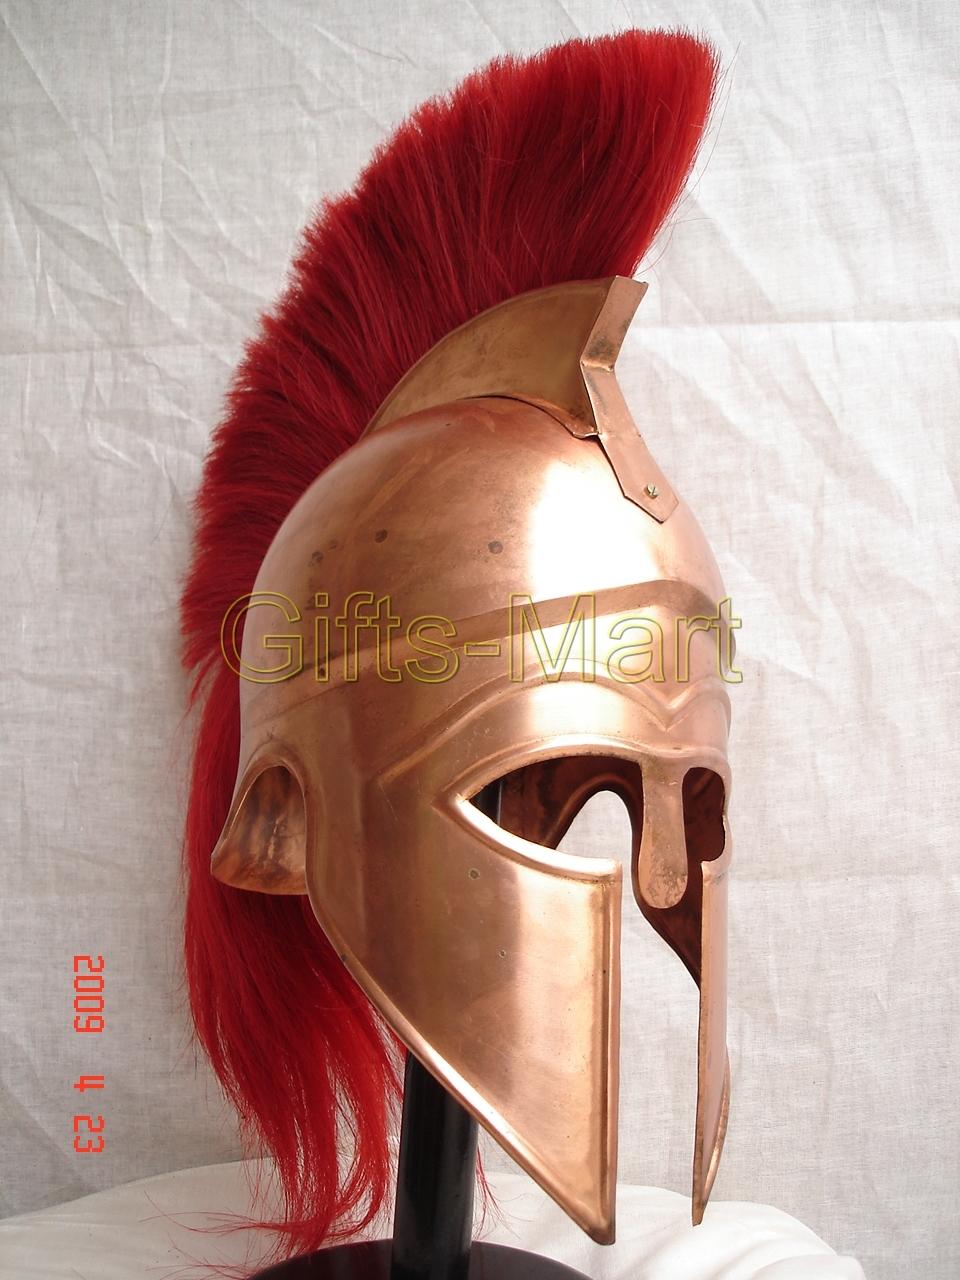 Greek CORINTHIAN HELMET, Collectible Roman Helmets CR, Medieval Militaria Armor